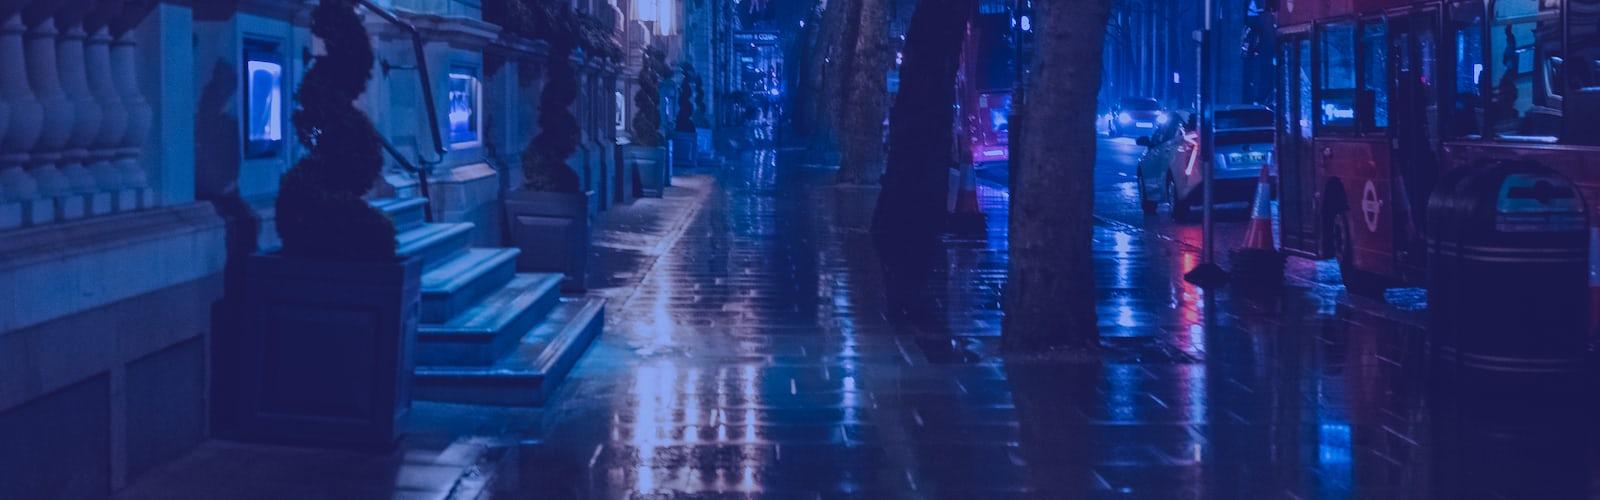 Download Wallpaper Aesthetic Dark City Cikimm Com